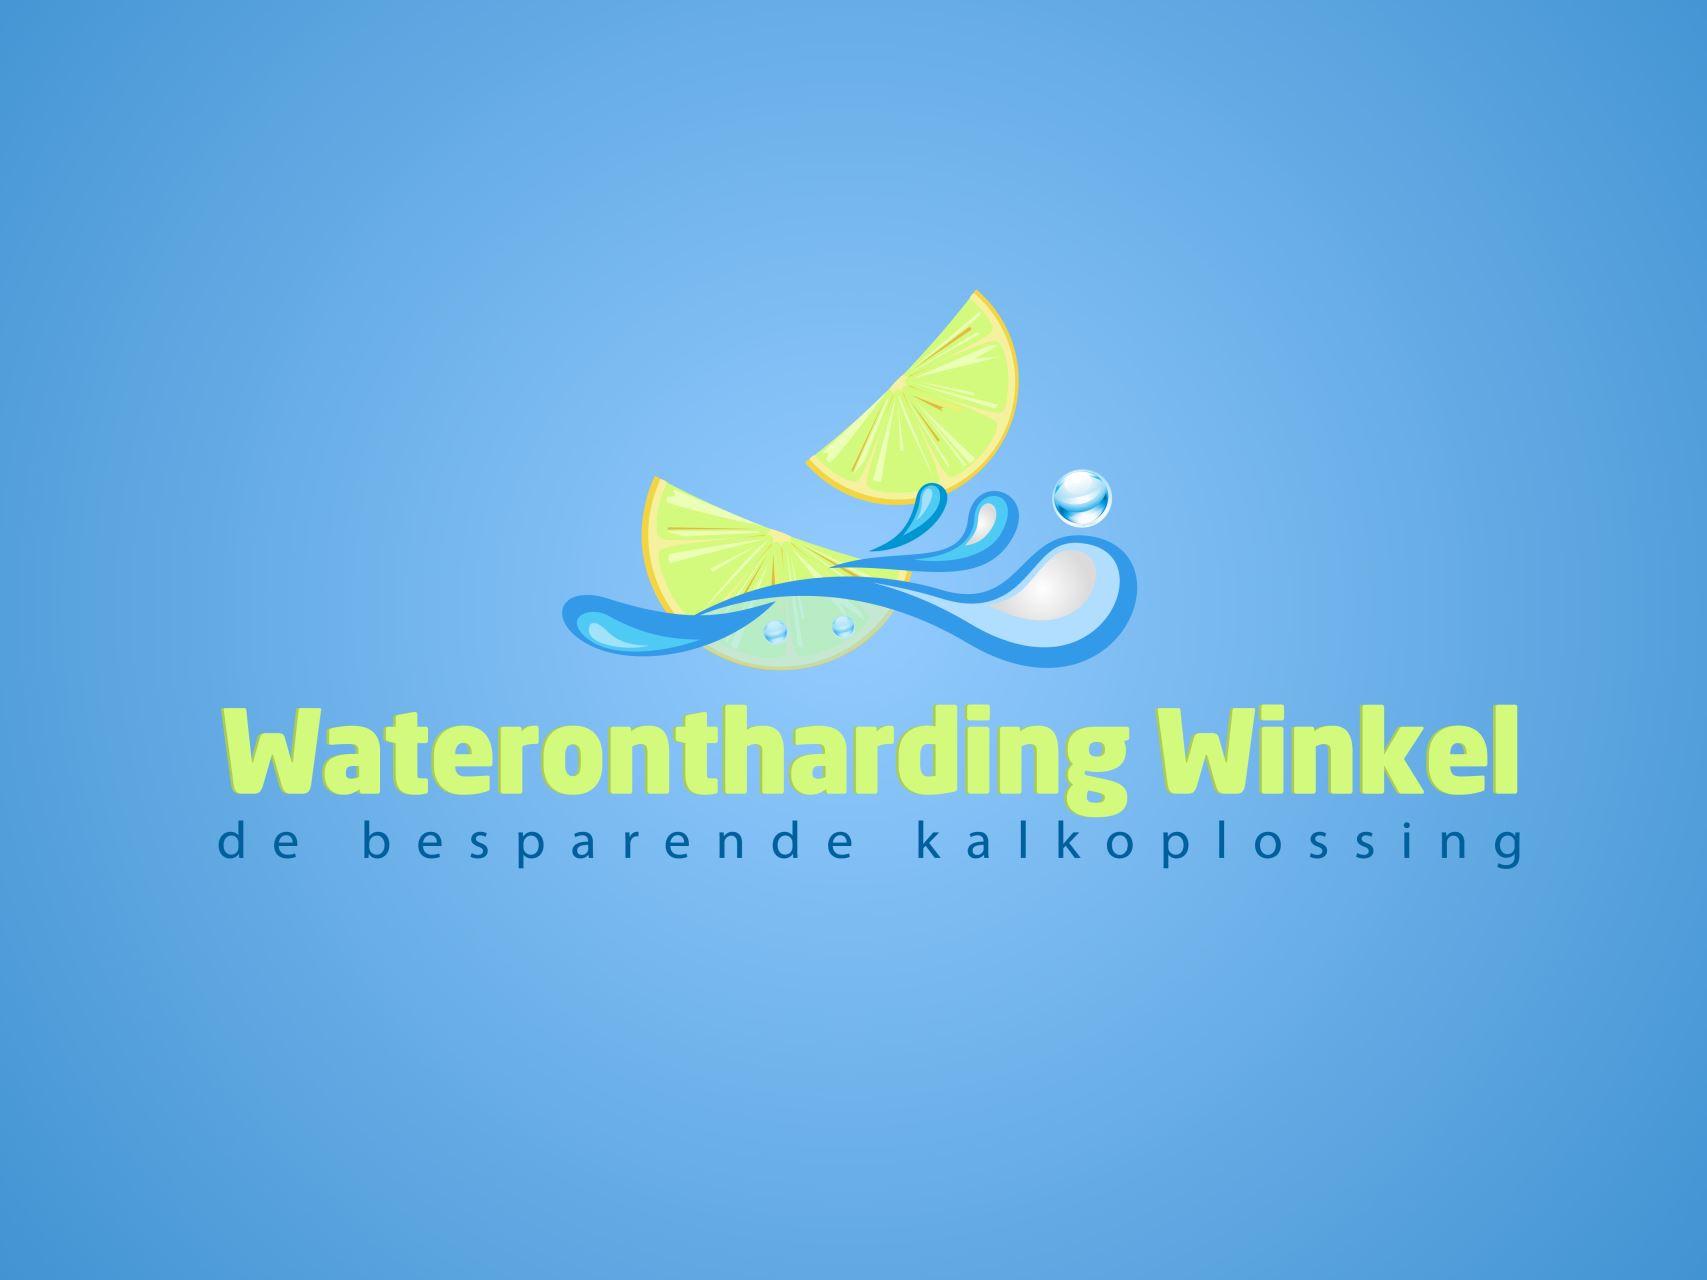 Waterontharding Winkel